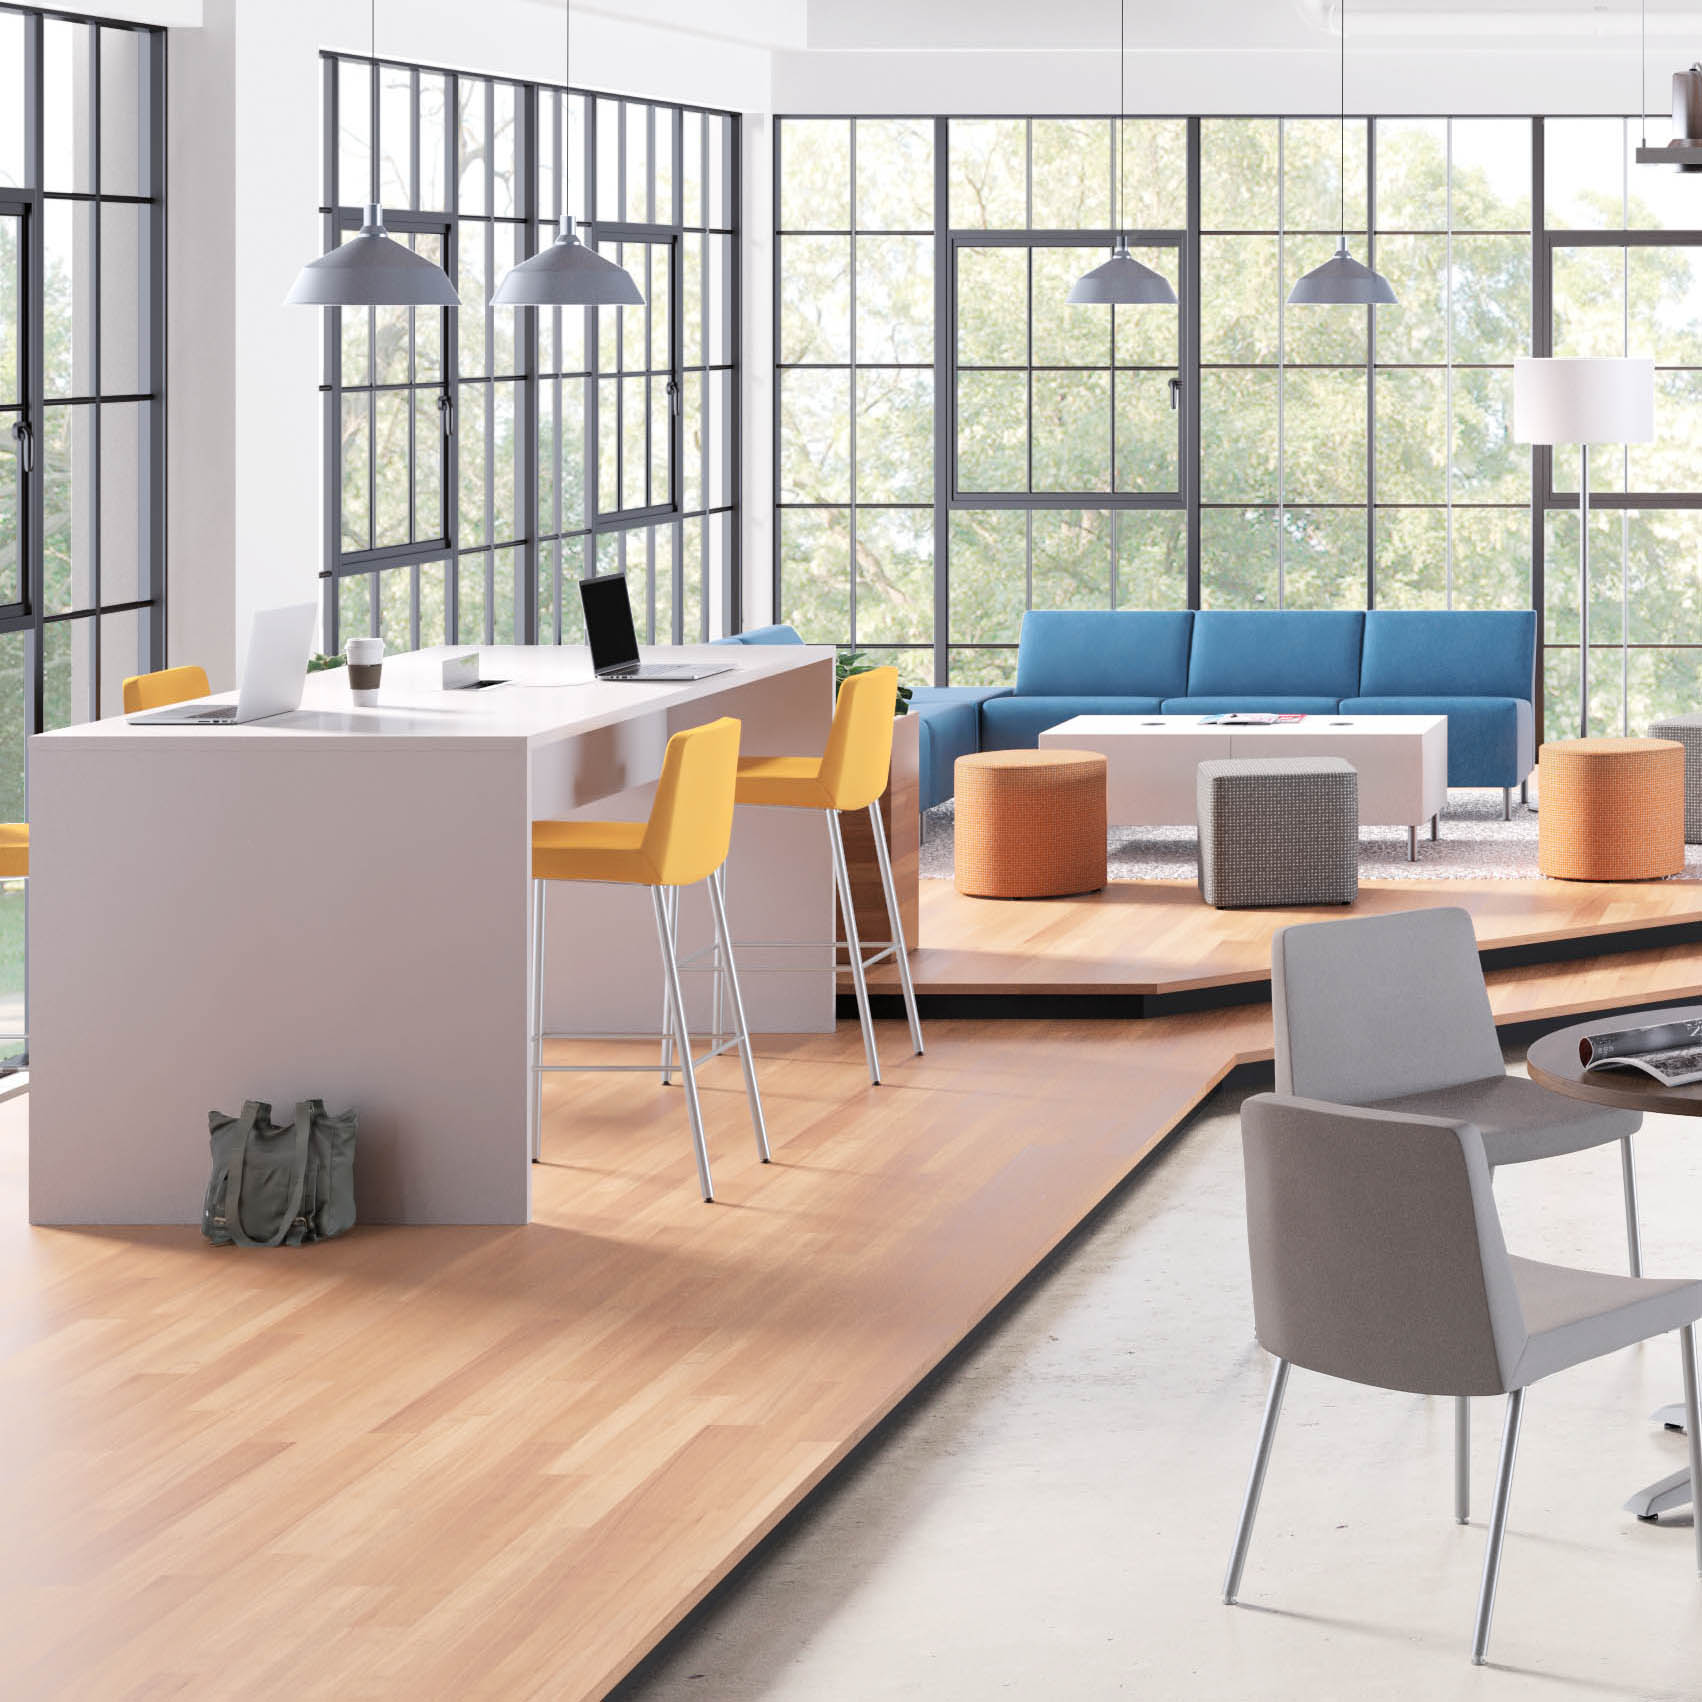 Preside Tables HON New Office Furniture Arthur P OHara Inc - Hon preside table